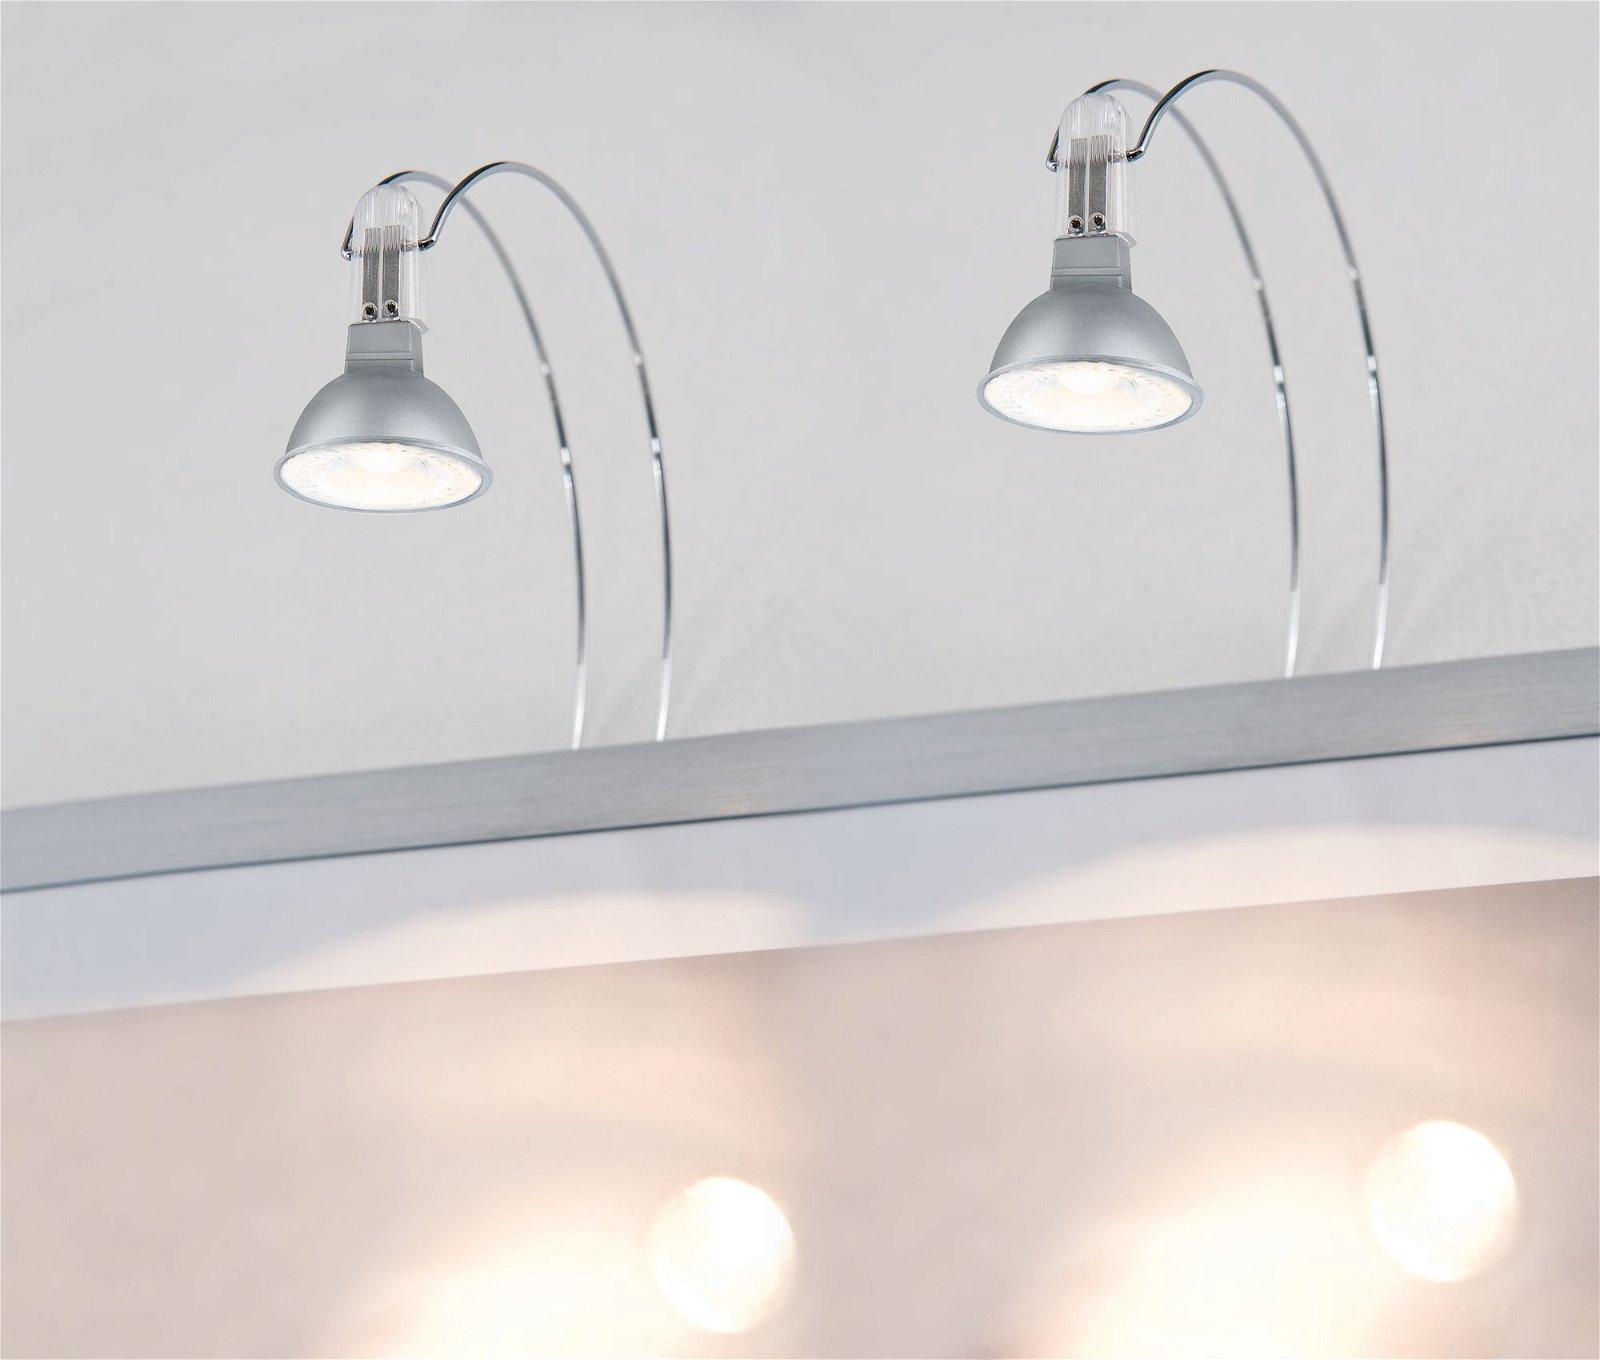 Galeria LED Spiegelleuchte Assistent II GU5,3 230V 2x4W Chrom